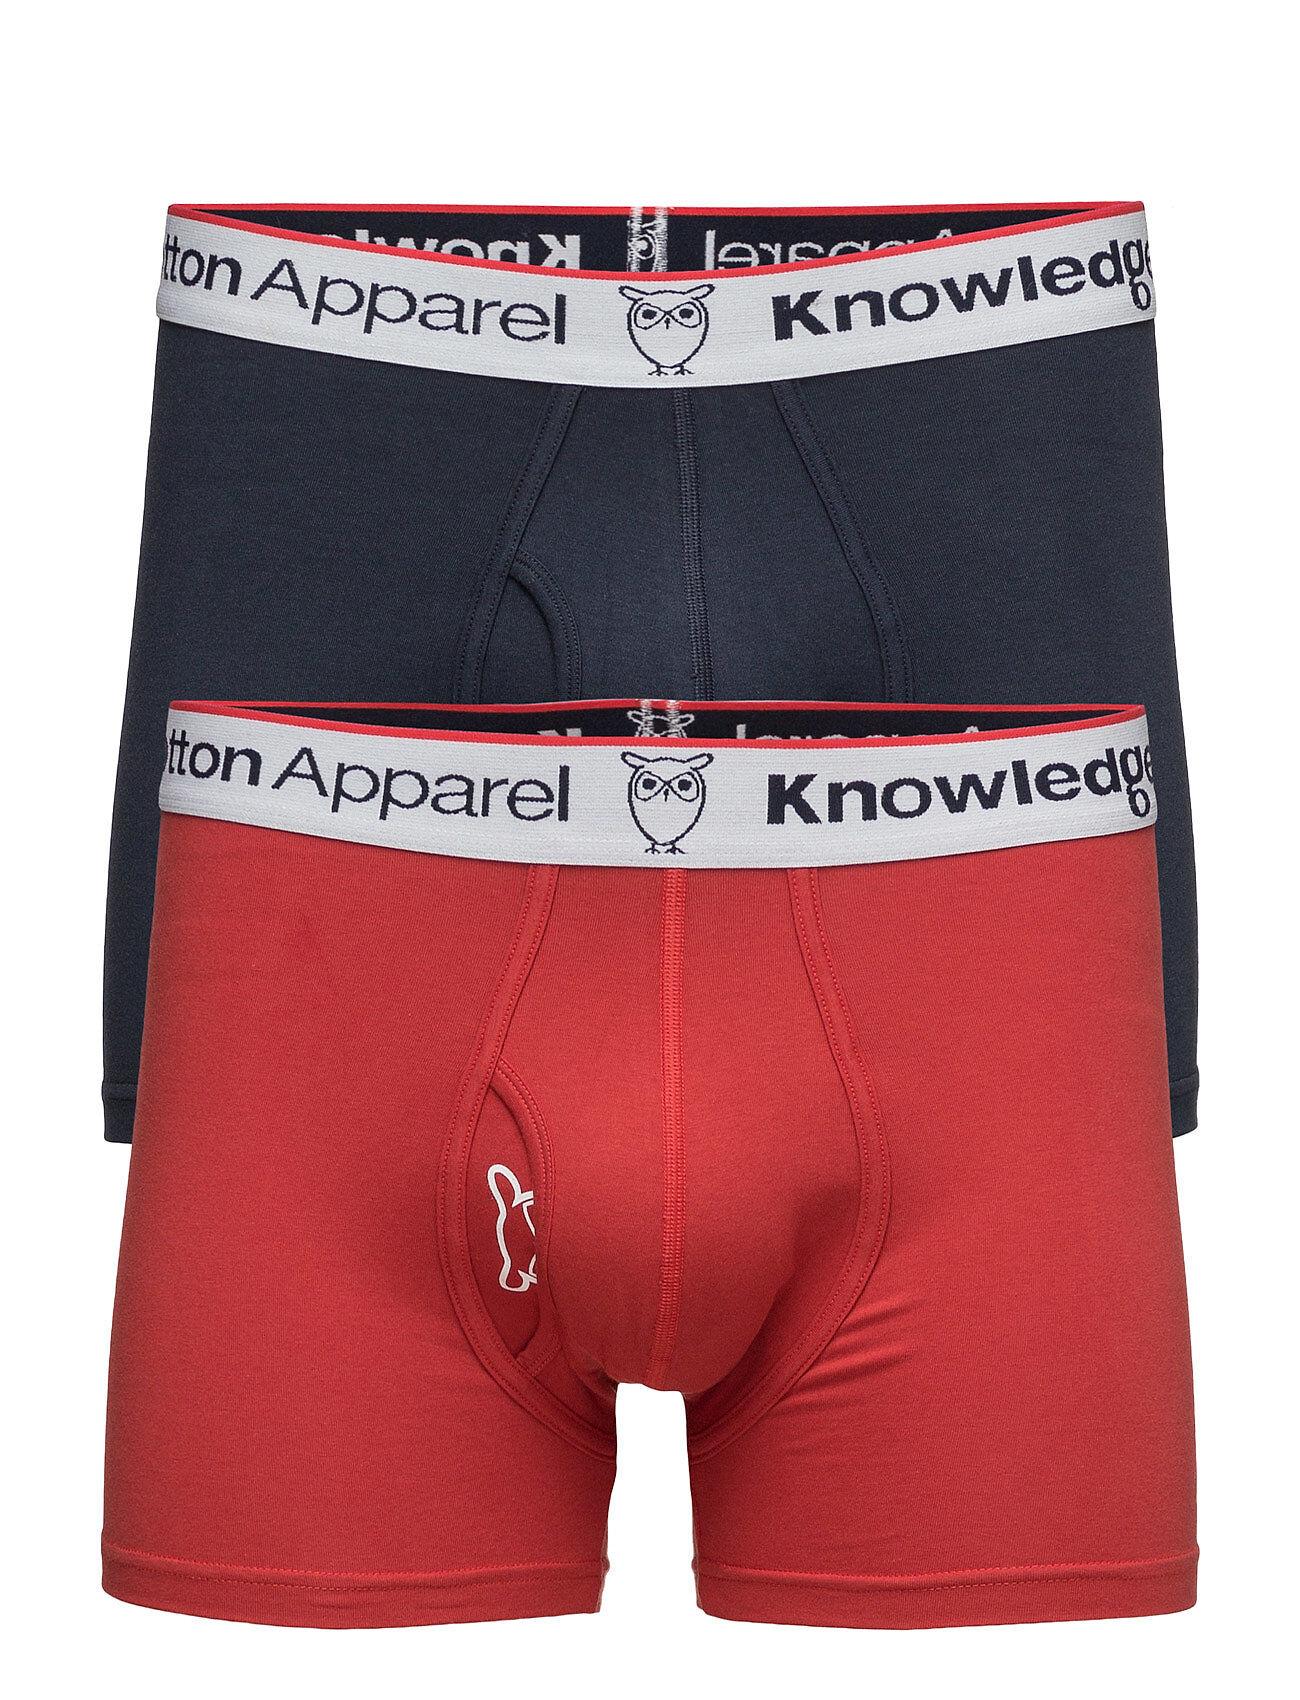 Knowledge Cotton Apparel Underwear 2pack Solid/Owl Gots/Vega